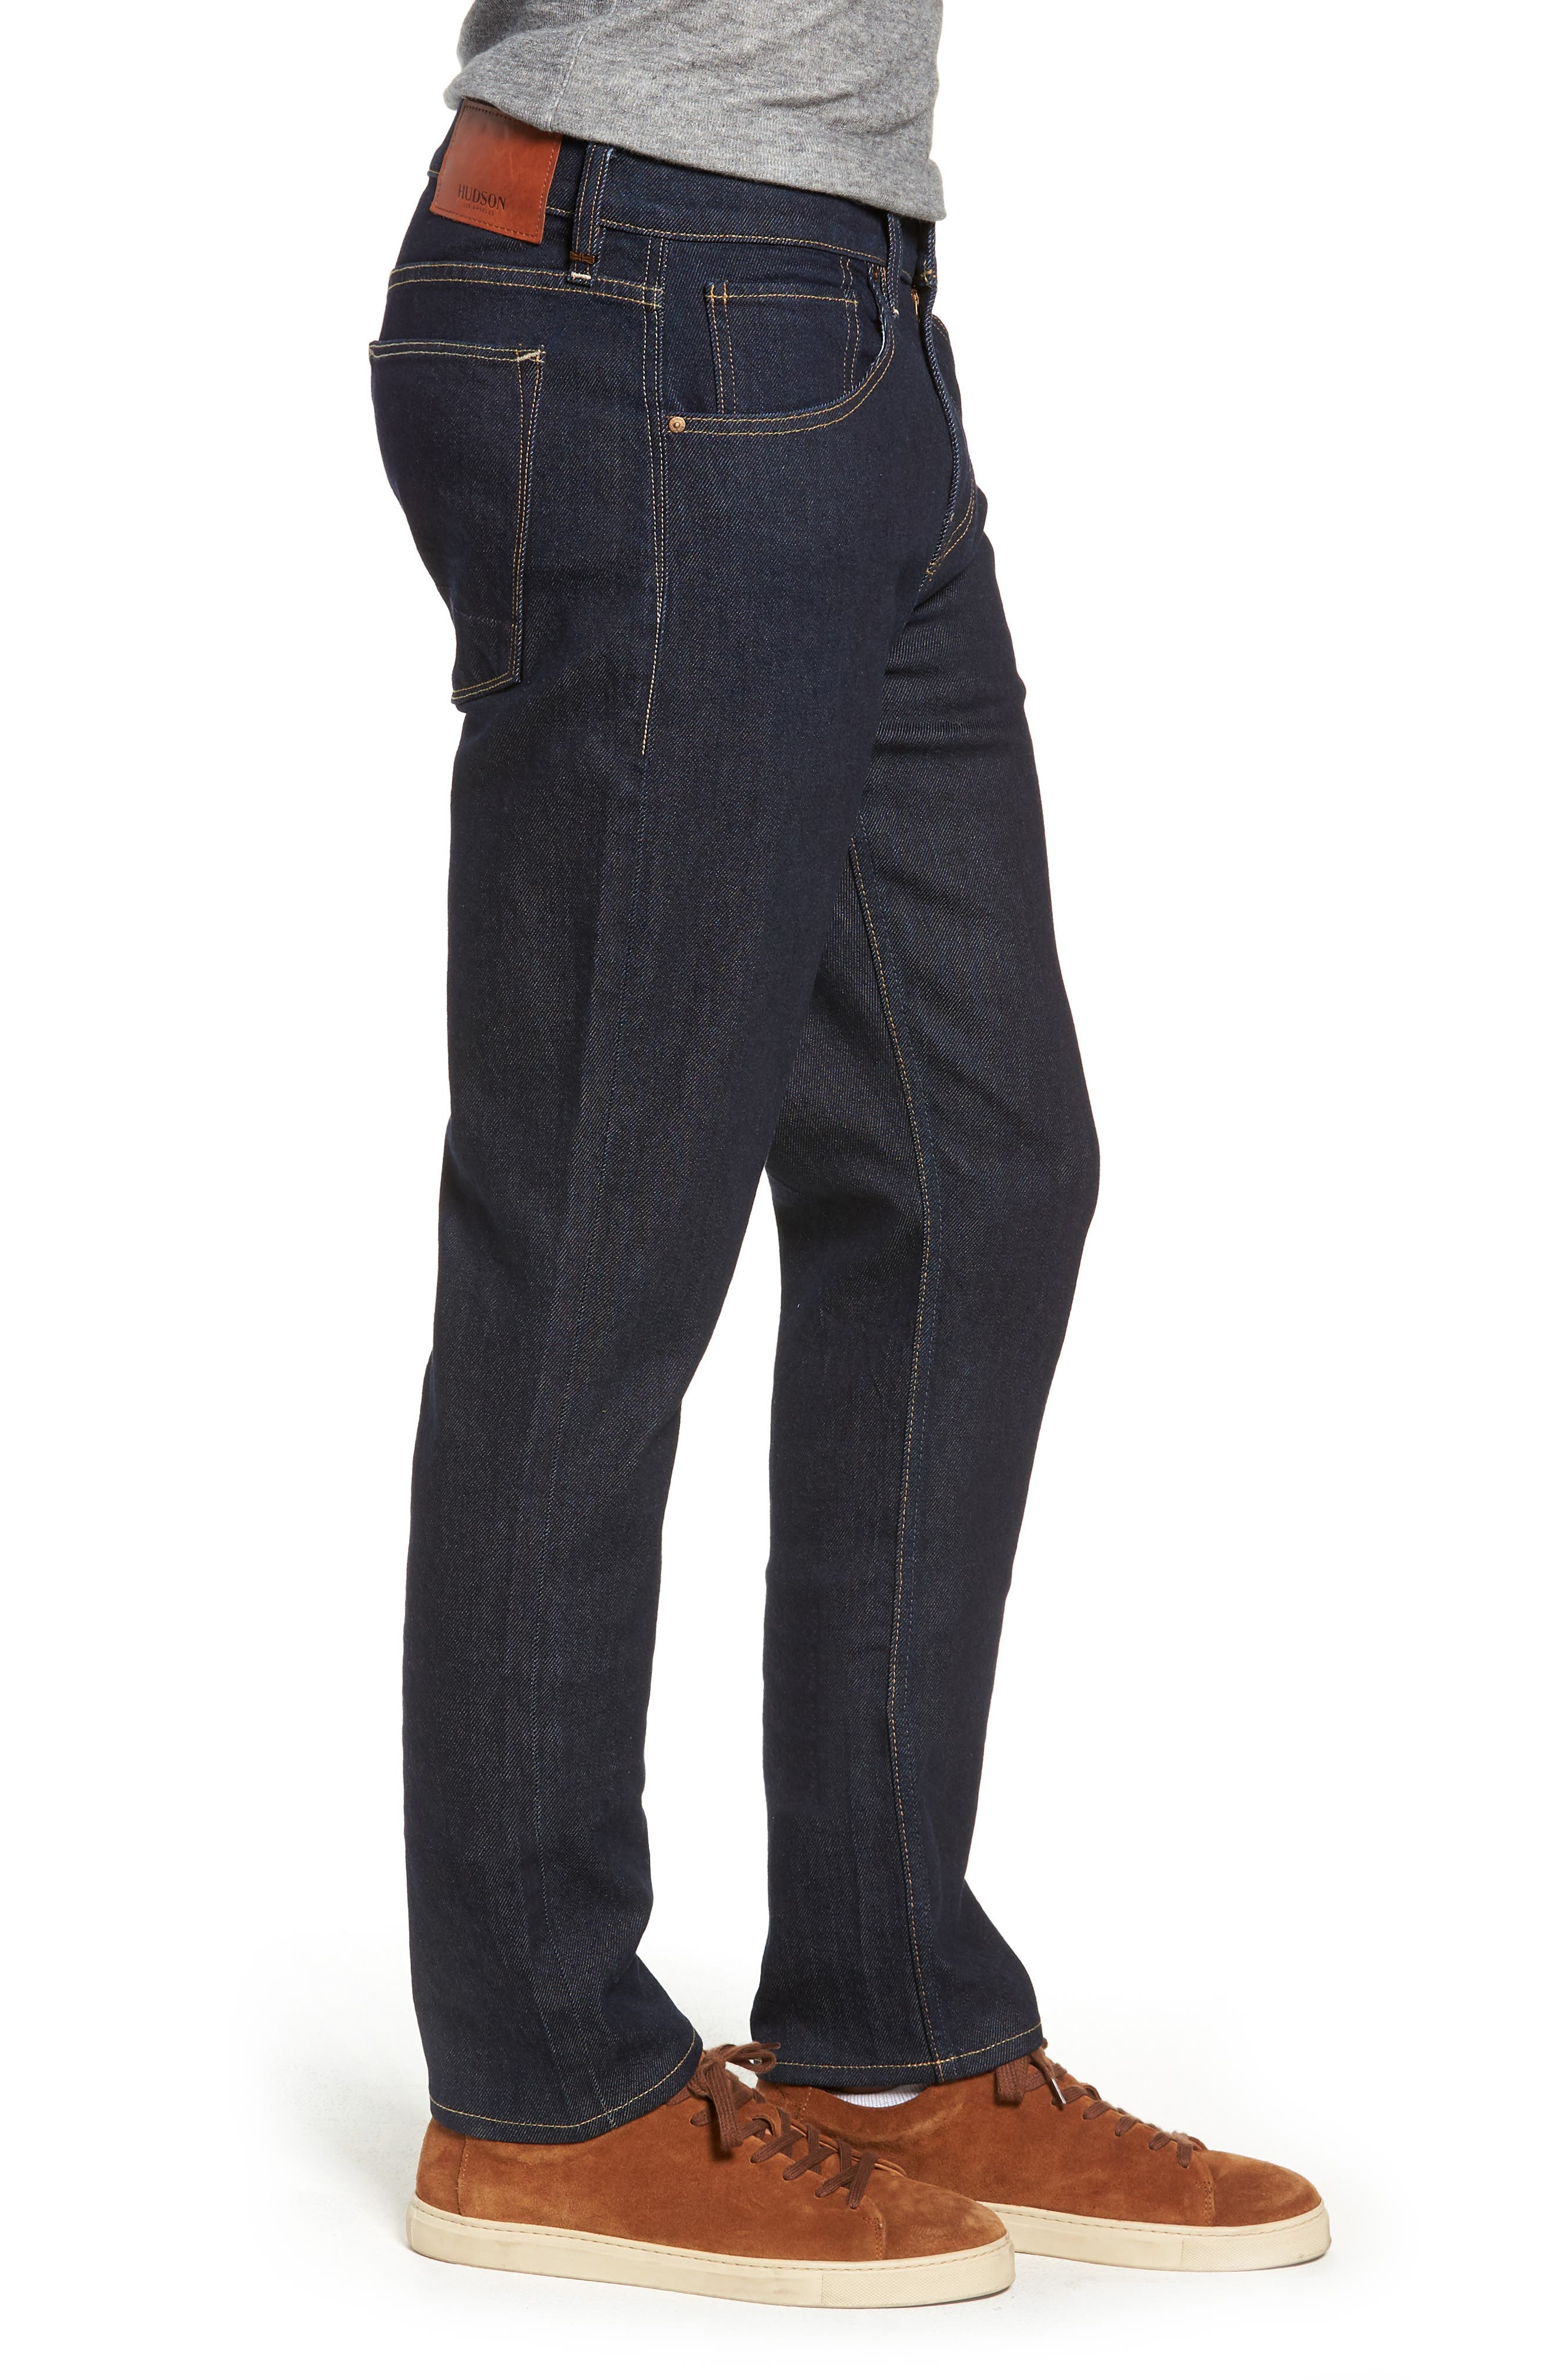 Blake Slim Fit Jeans,                             Alternate thumbnail 3, color,                             DUARTE